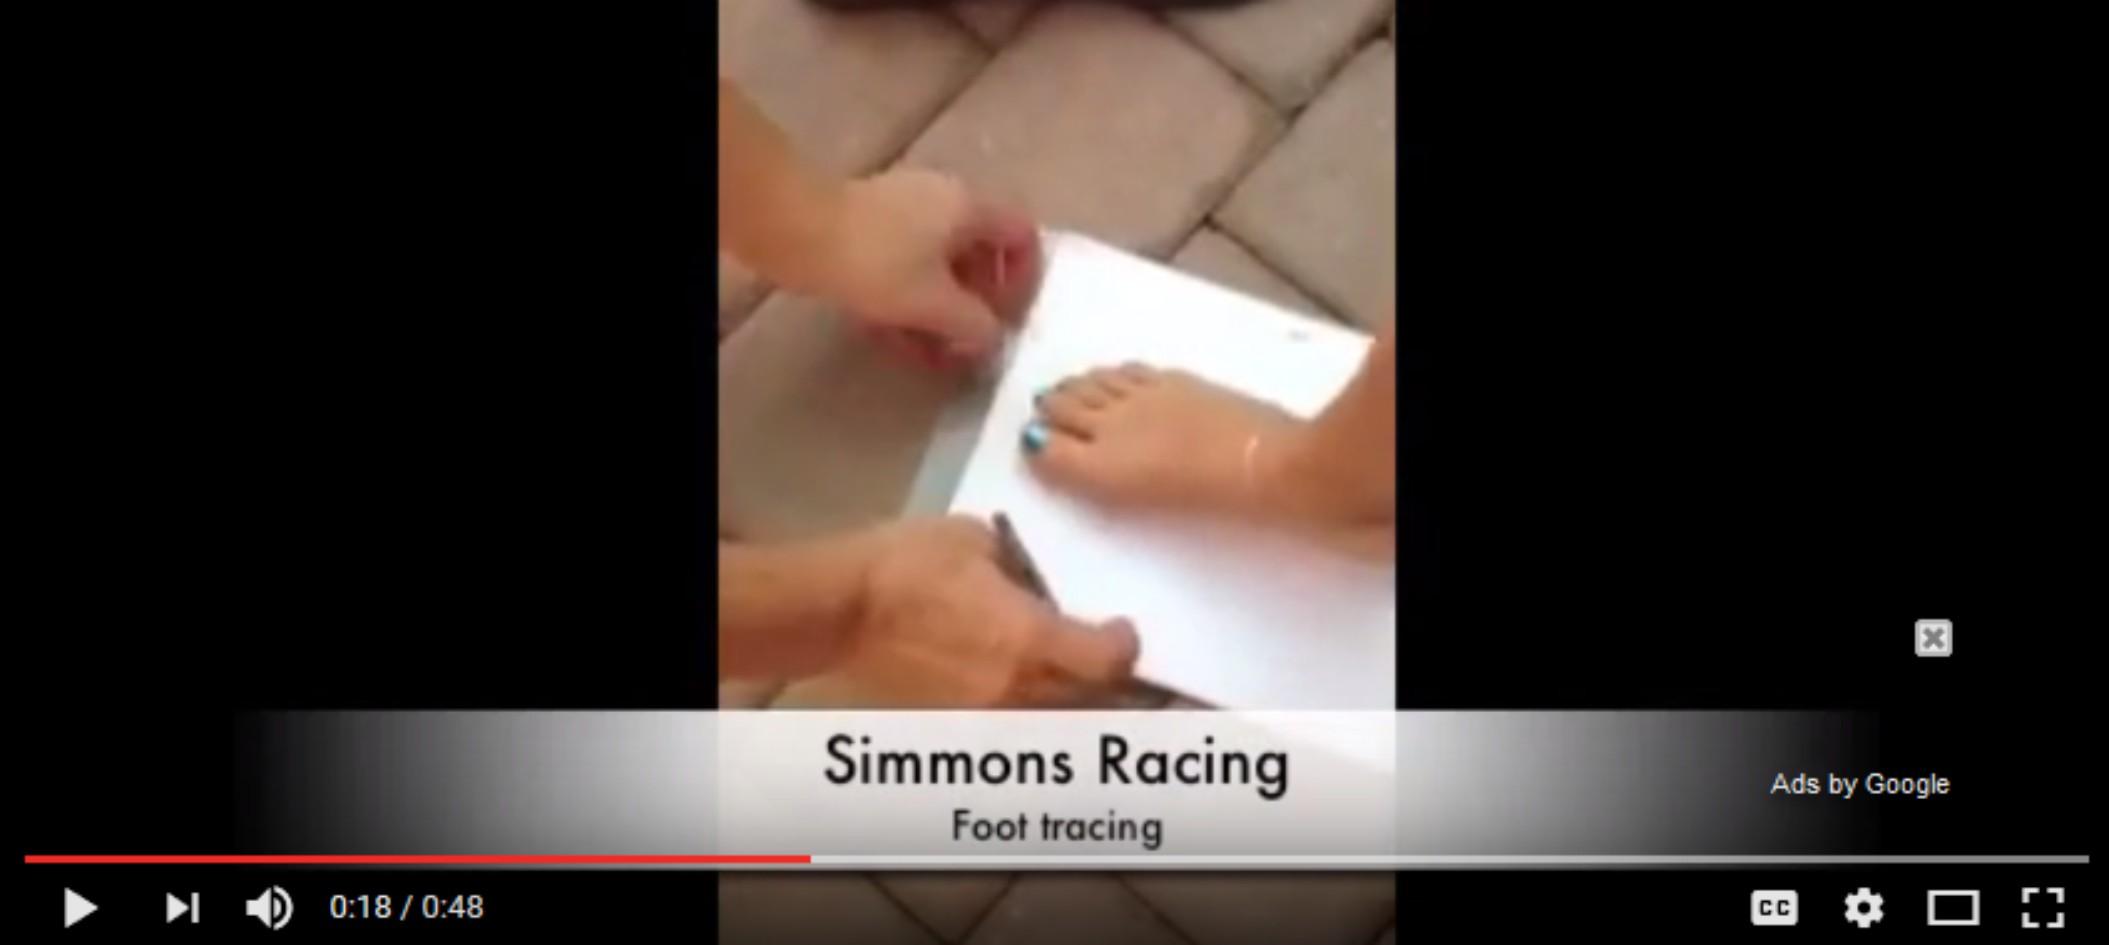 feet-tracing